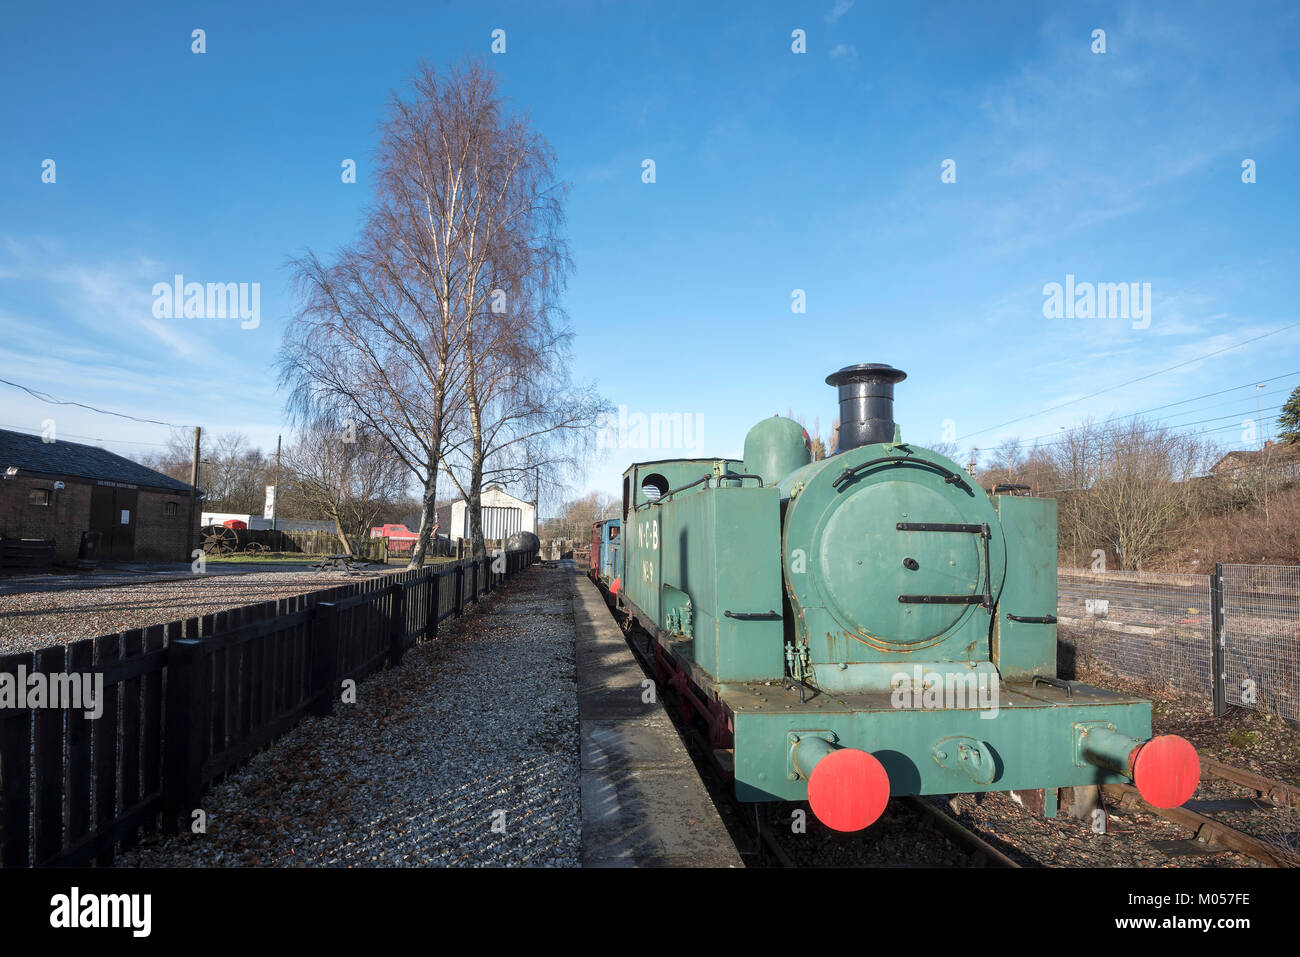 Old No 9 Steam Locomotive at Summerlee Industrial Heritage park. - Stock Image